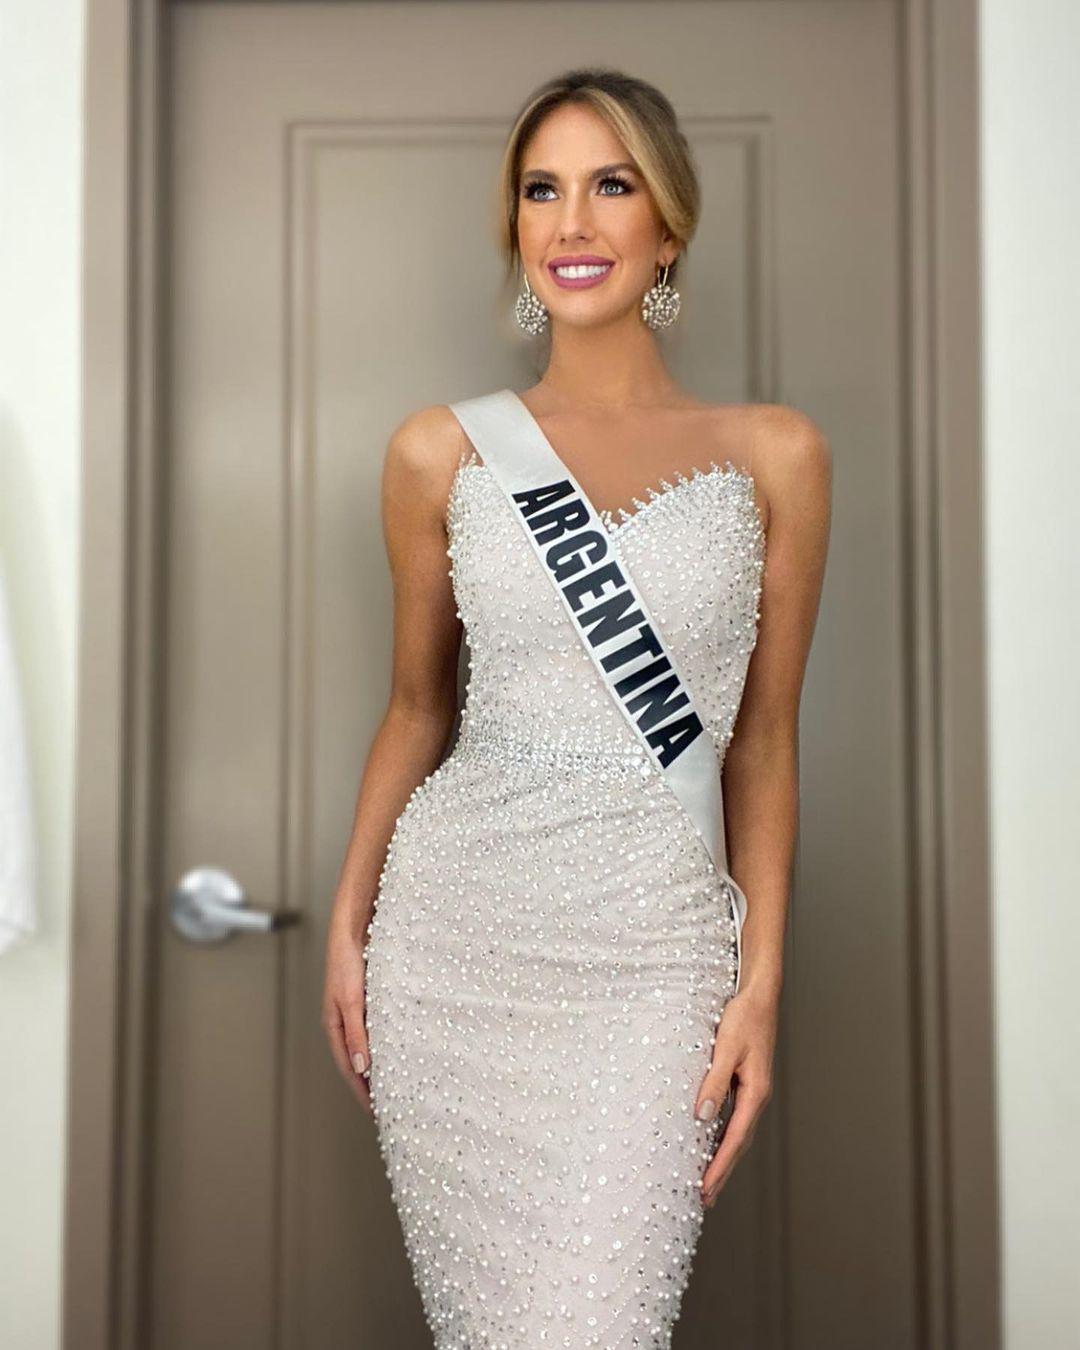 alina akselrad, top 21 de miss universe 2020. - Página 12 20750215